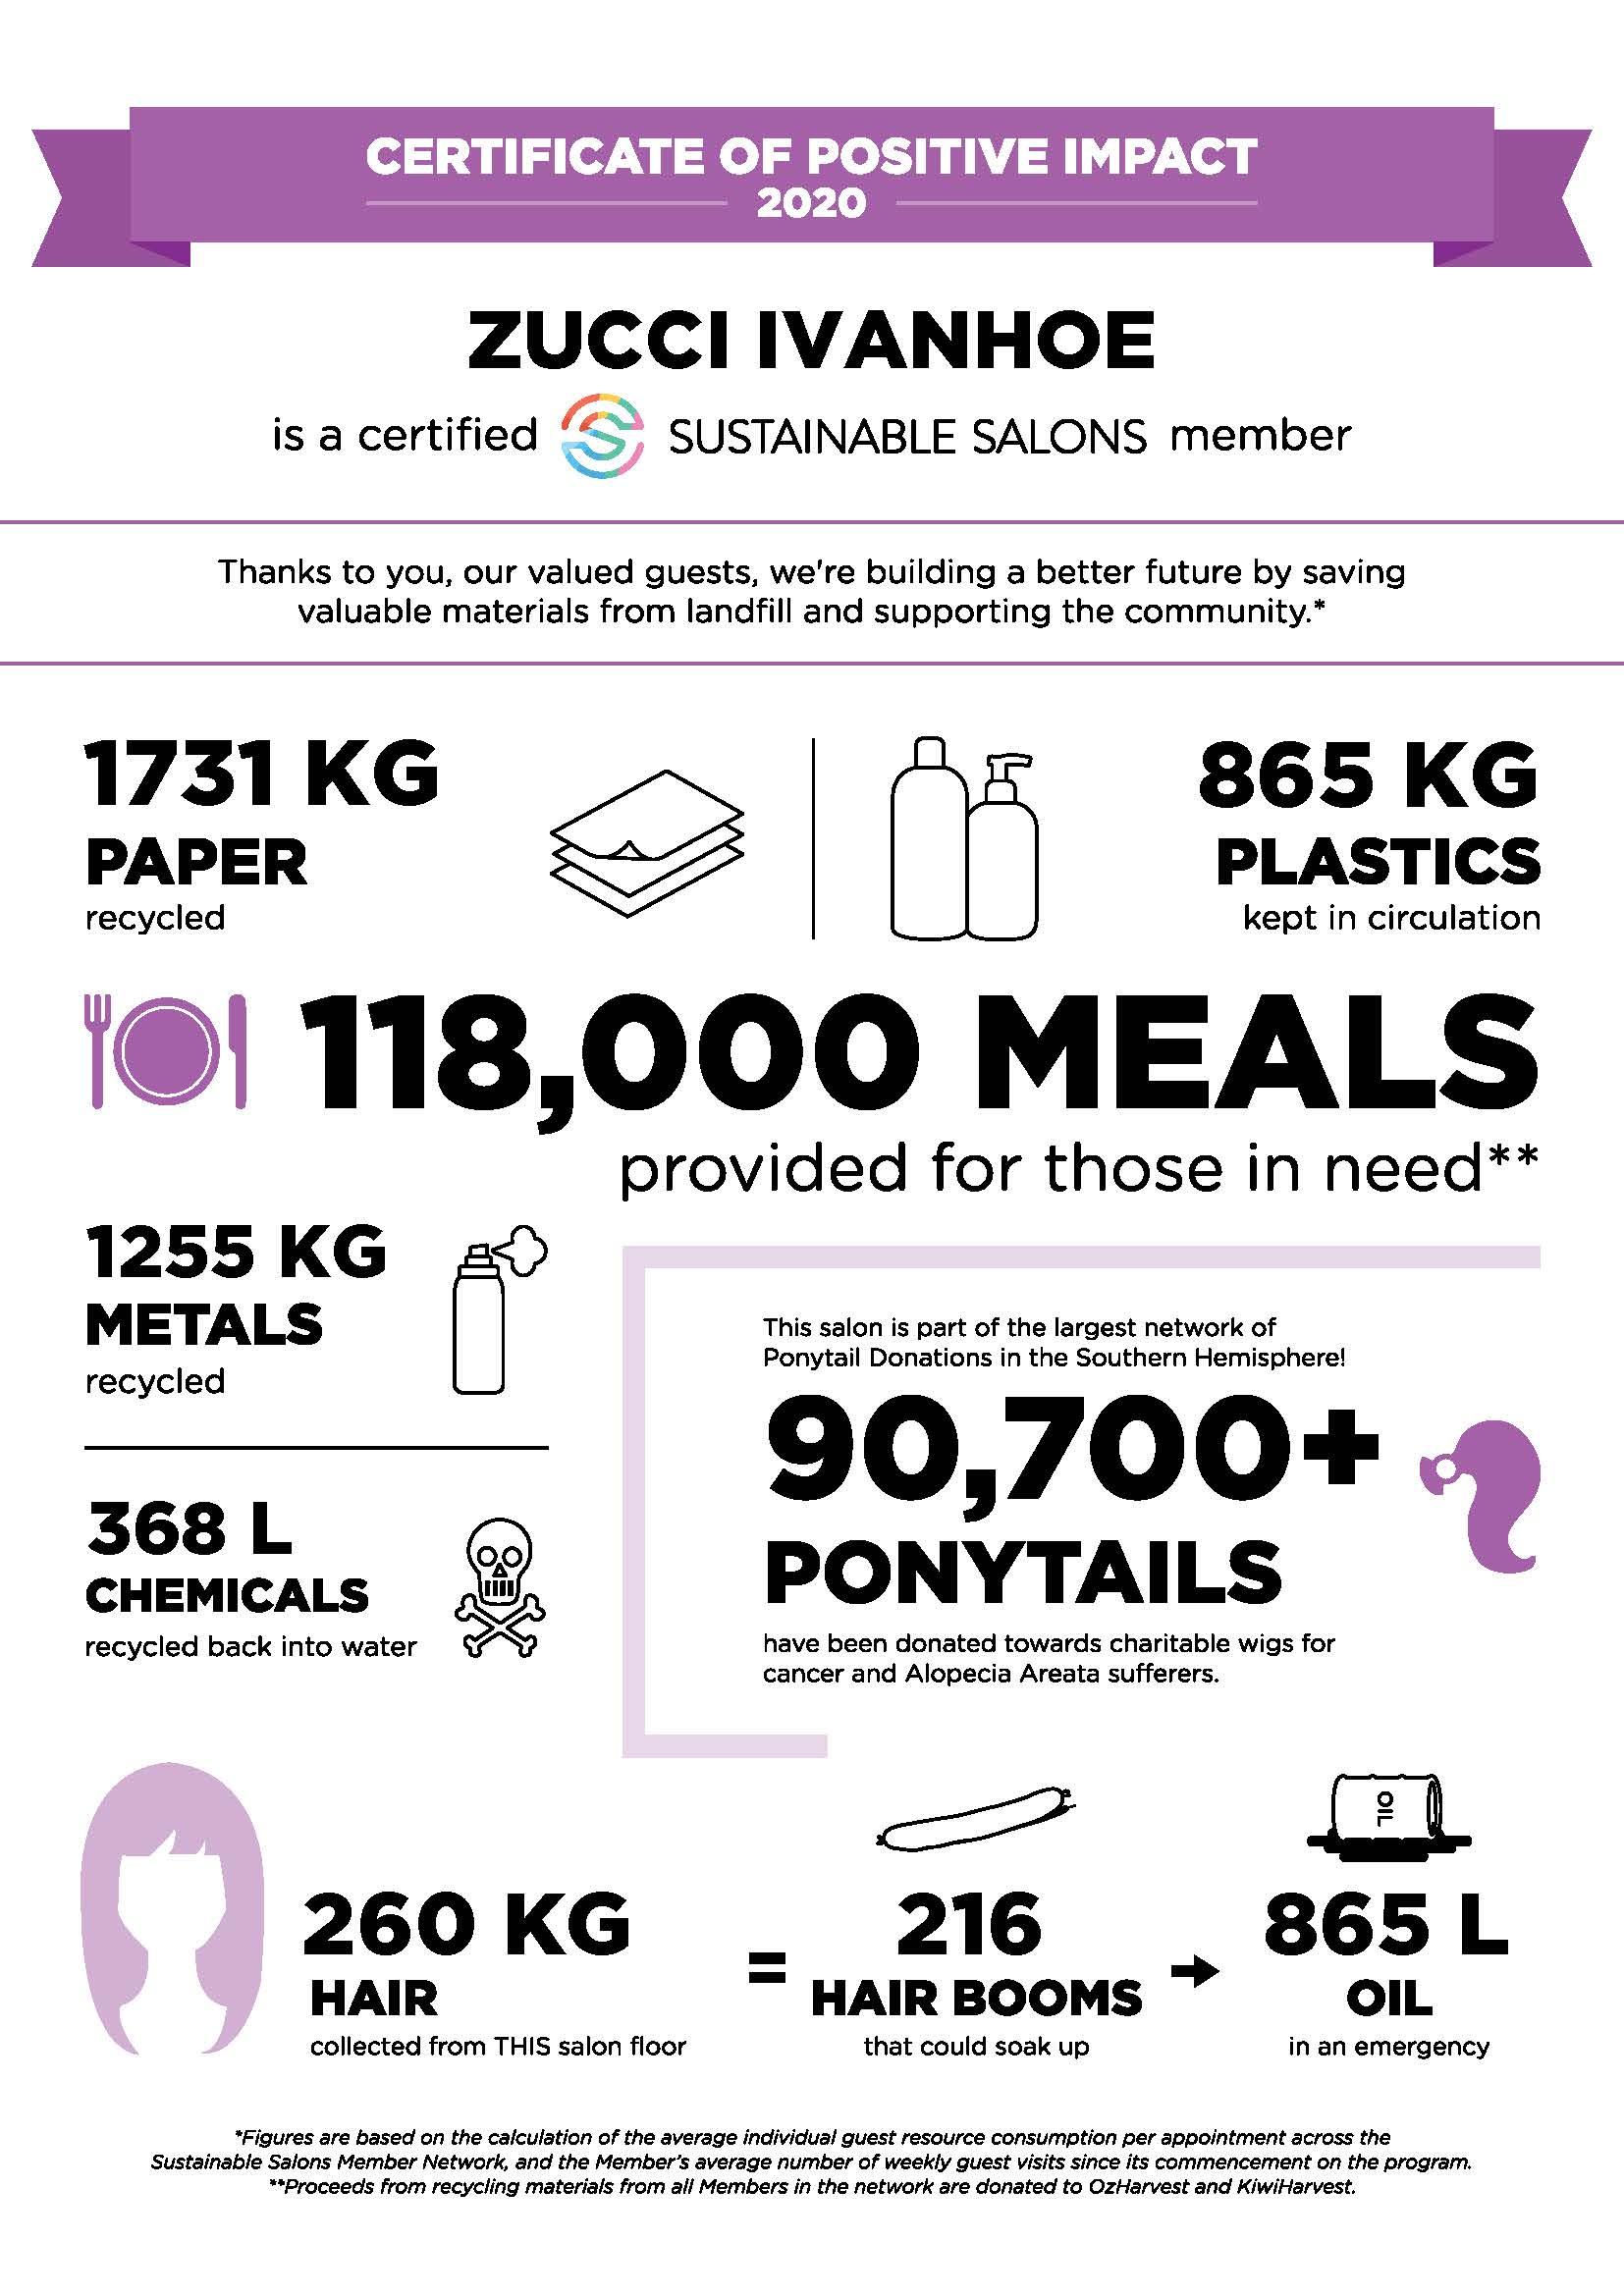 Zucci Ivanhoe's Sustainable Salons Impact Statement.